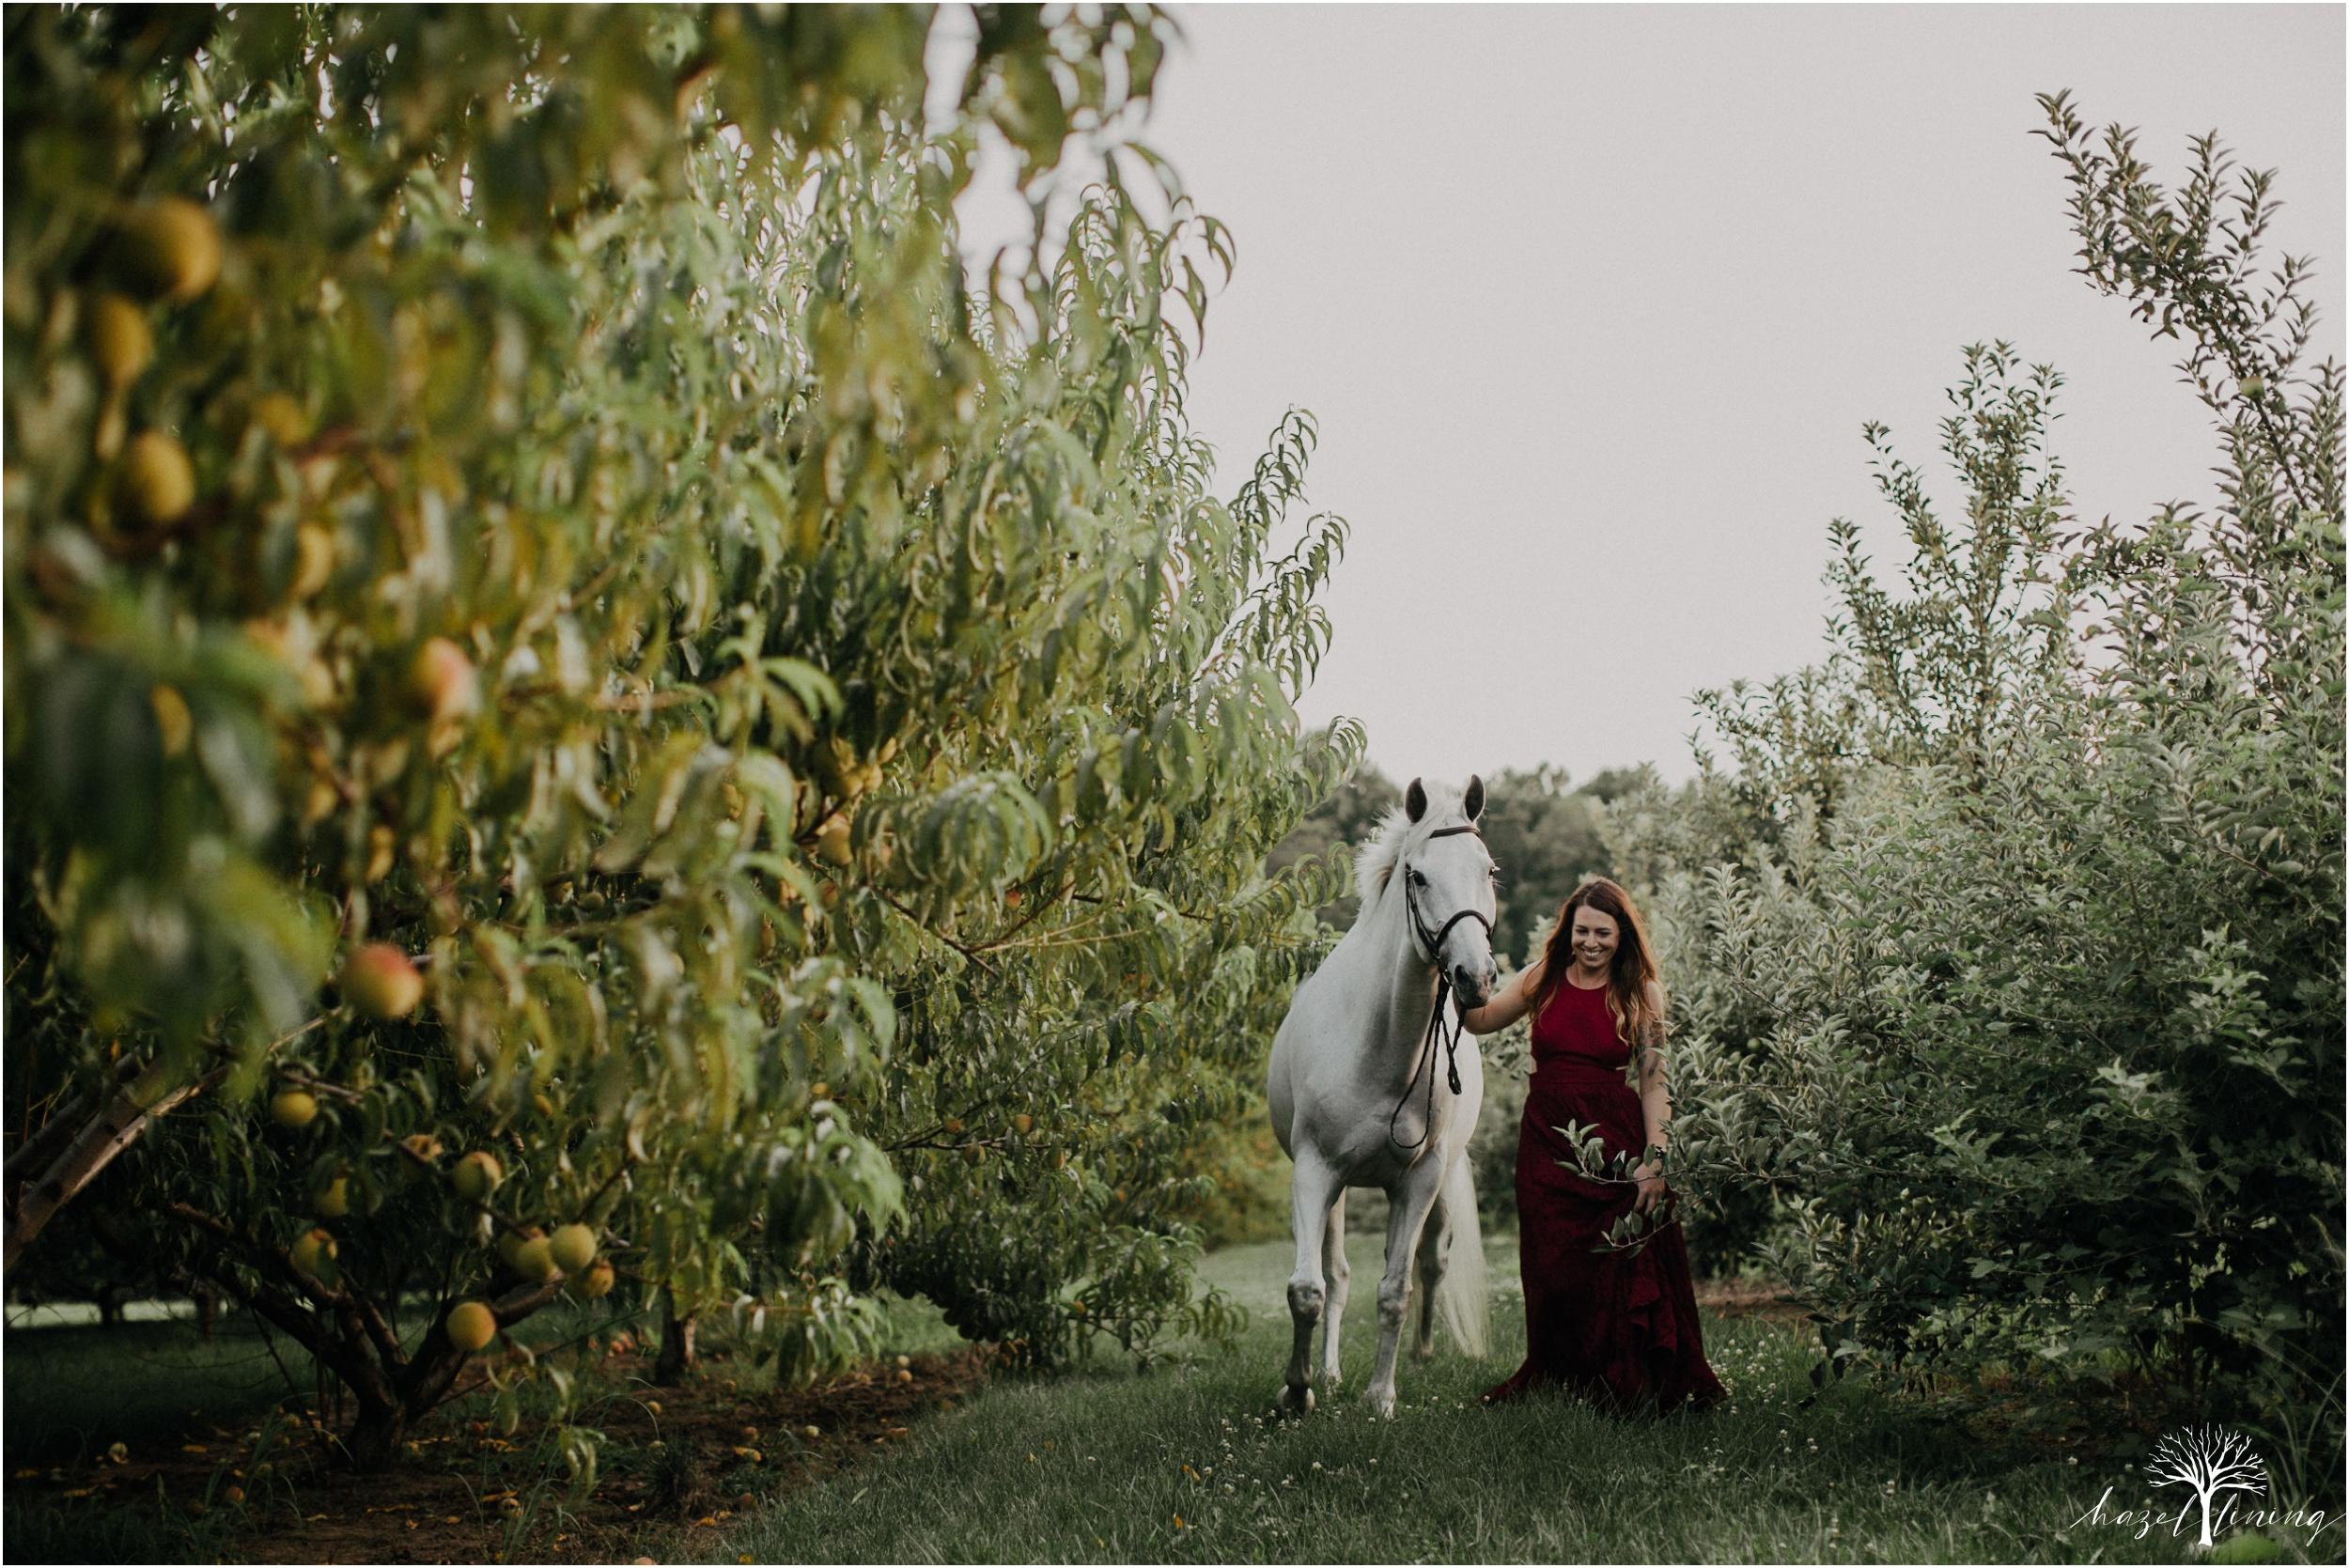 taylor-adams-and-horse-delaware-valley-university-delval-summer-equestrian-portrait-session-hazel-lining-photography-destination-elopement-wedding-engagement-photography_0049.jpg